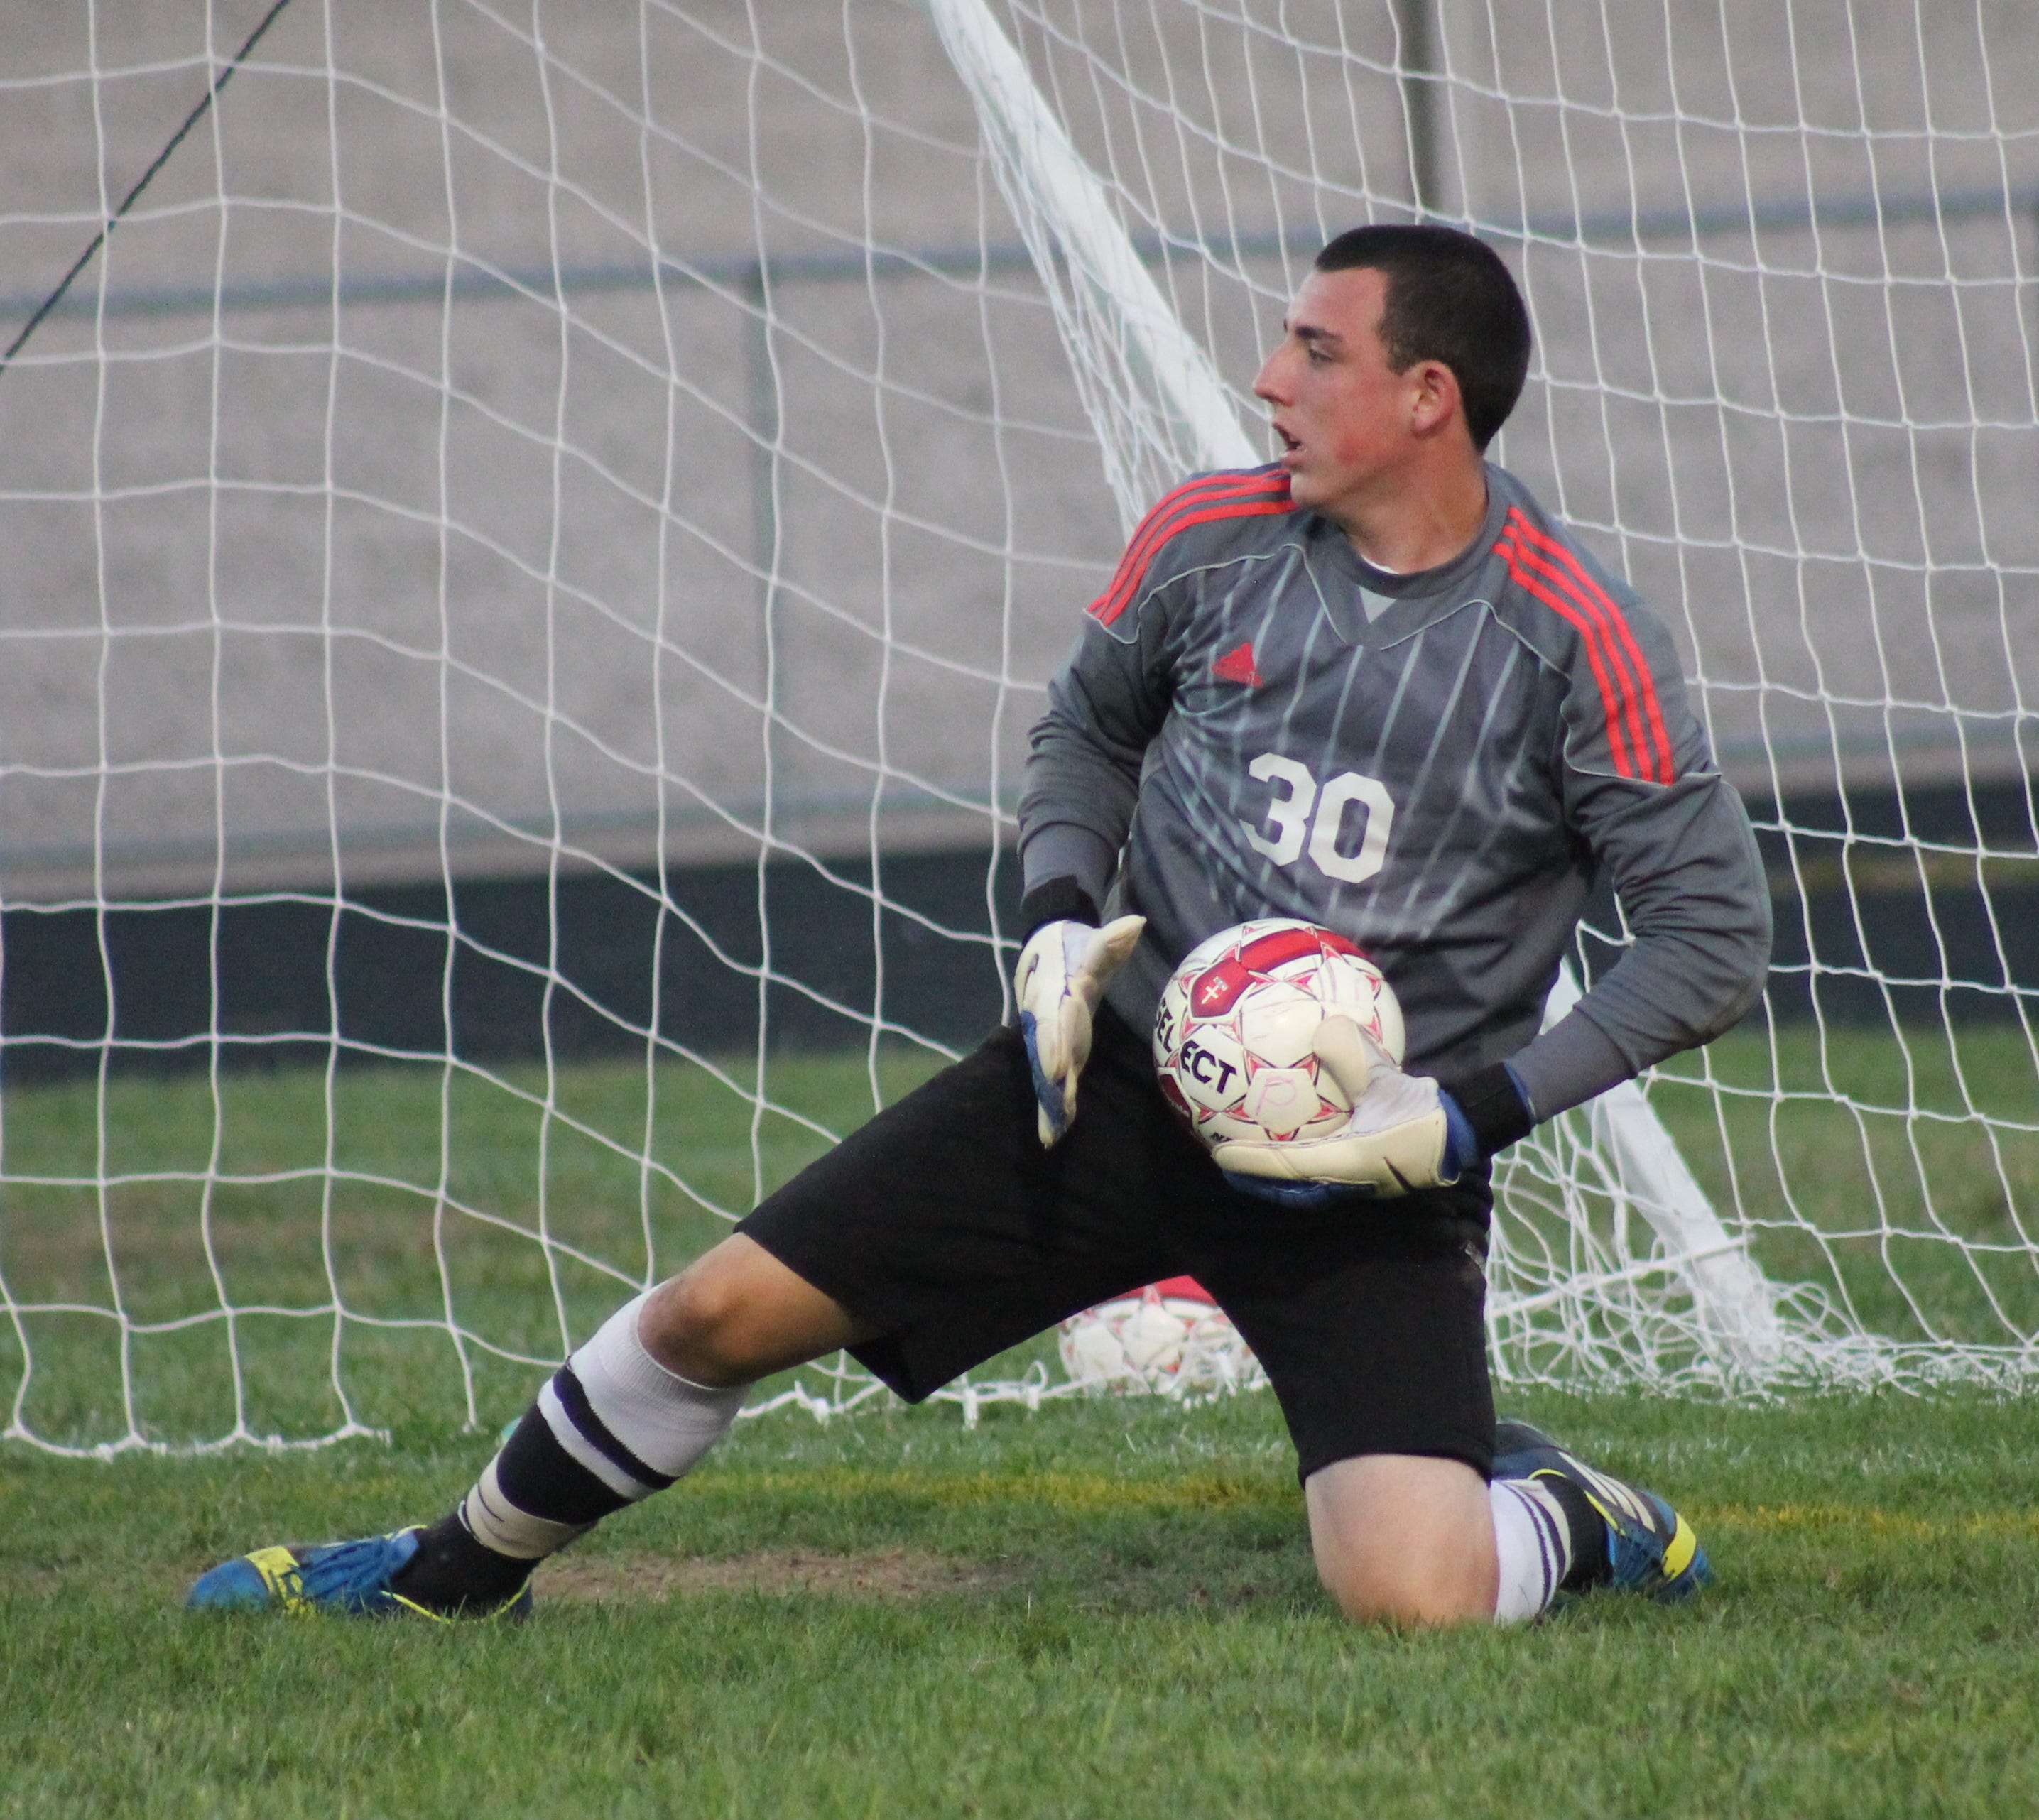 Deer Park goalkeeper Corey Huneke makes a save for the Wildcats.